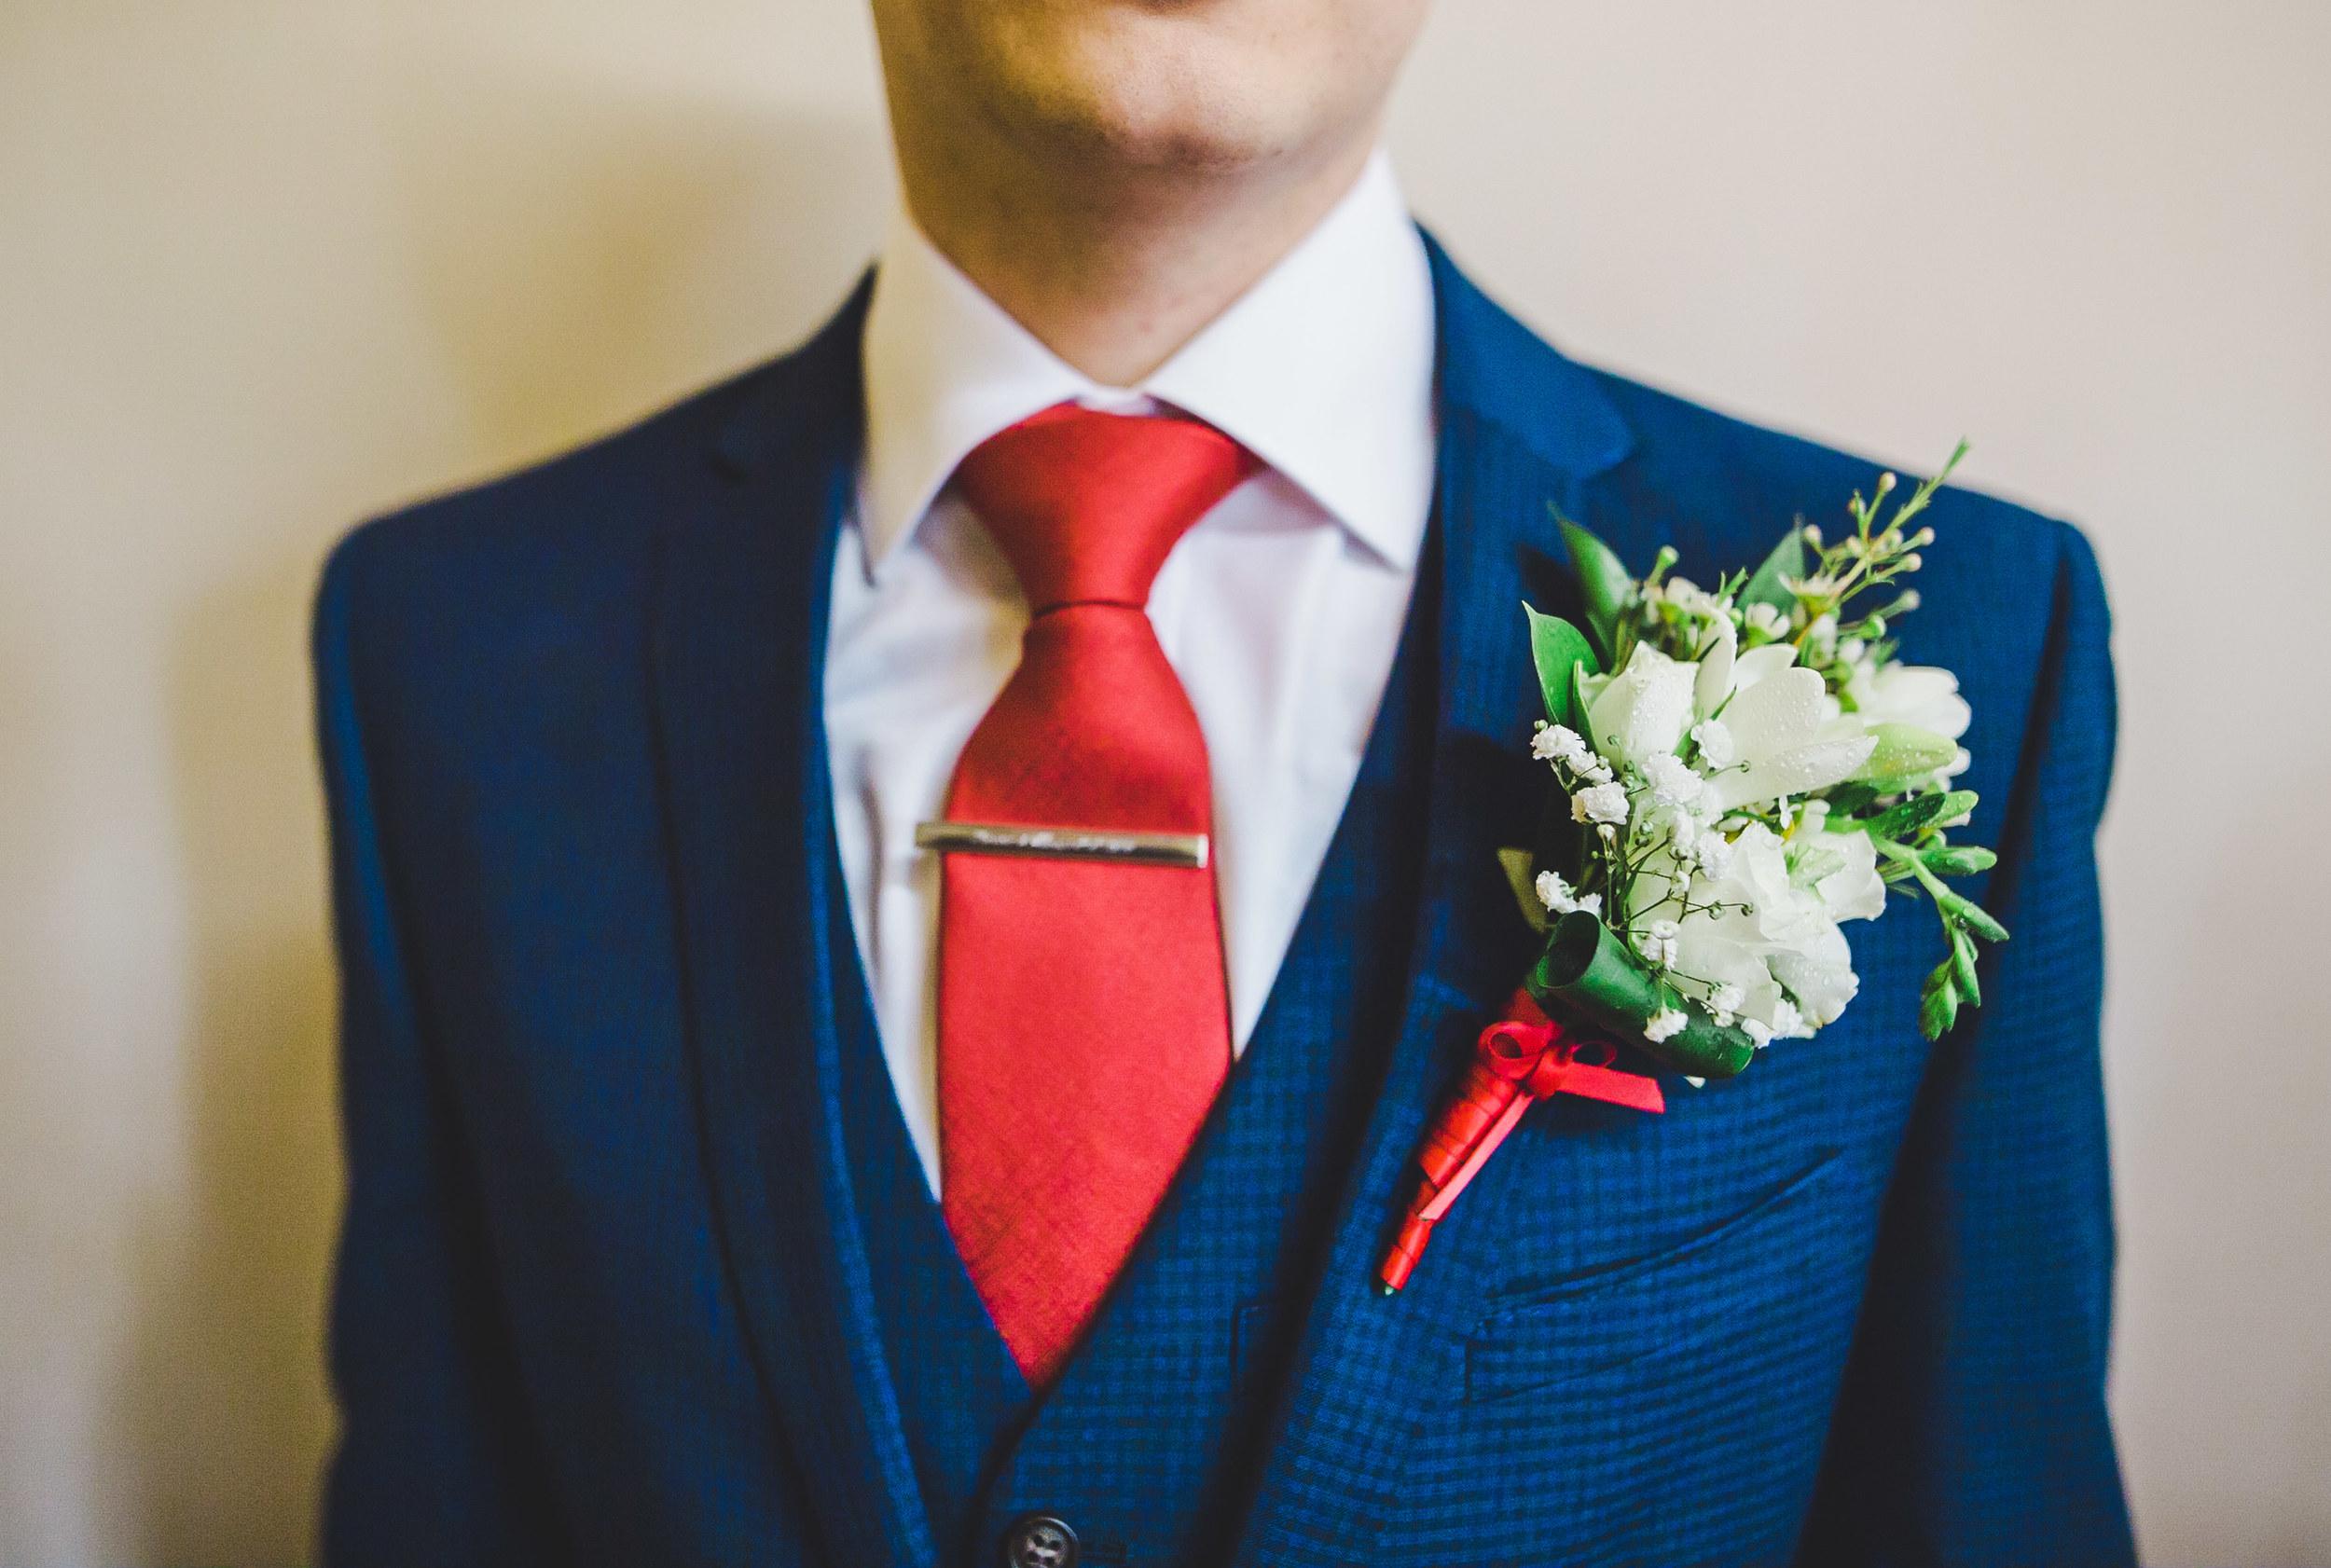 groomswear inspiration